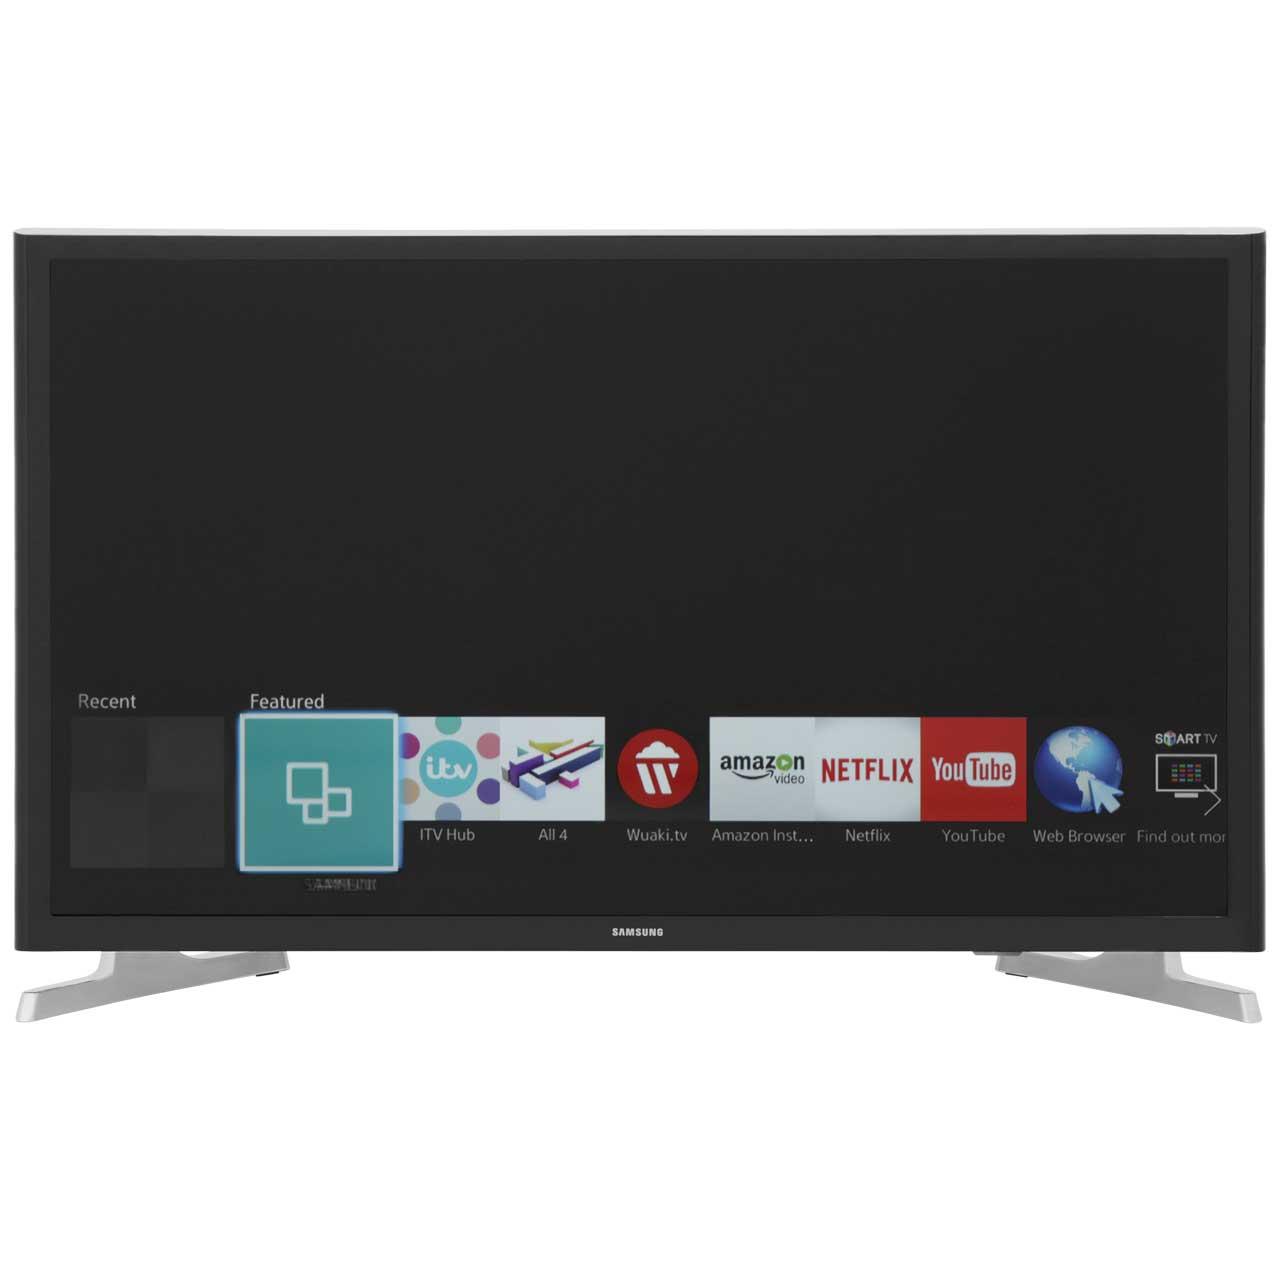 Samsung Ue32j4510 32 Inch Smart Led Tv 720p Hd Ready 2